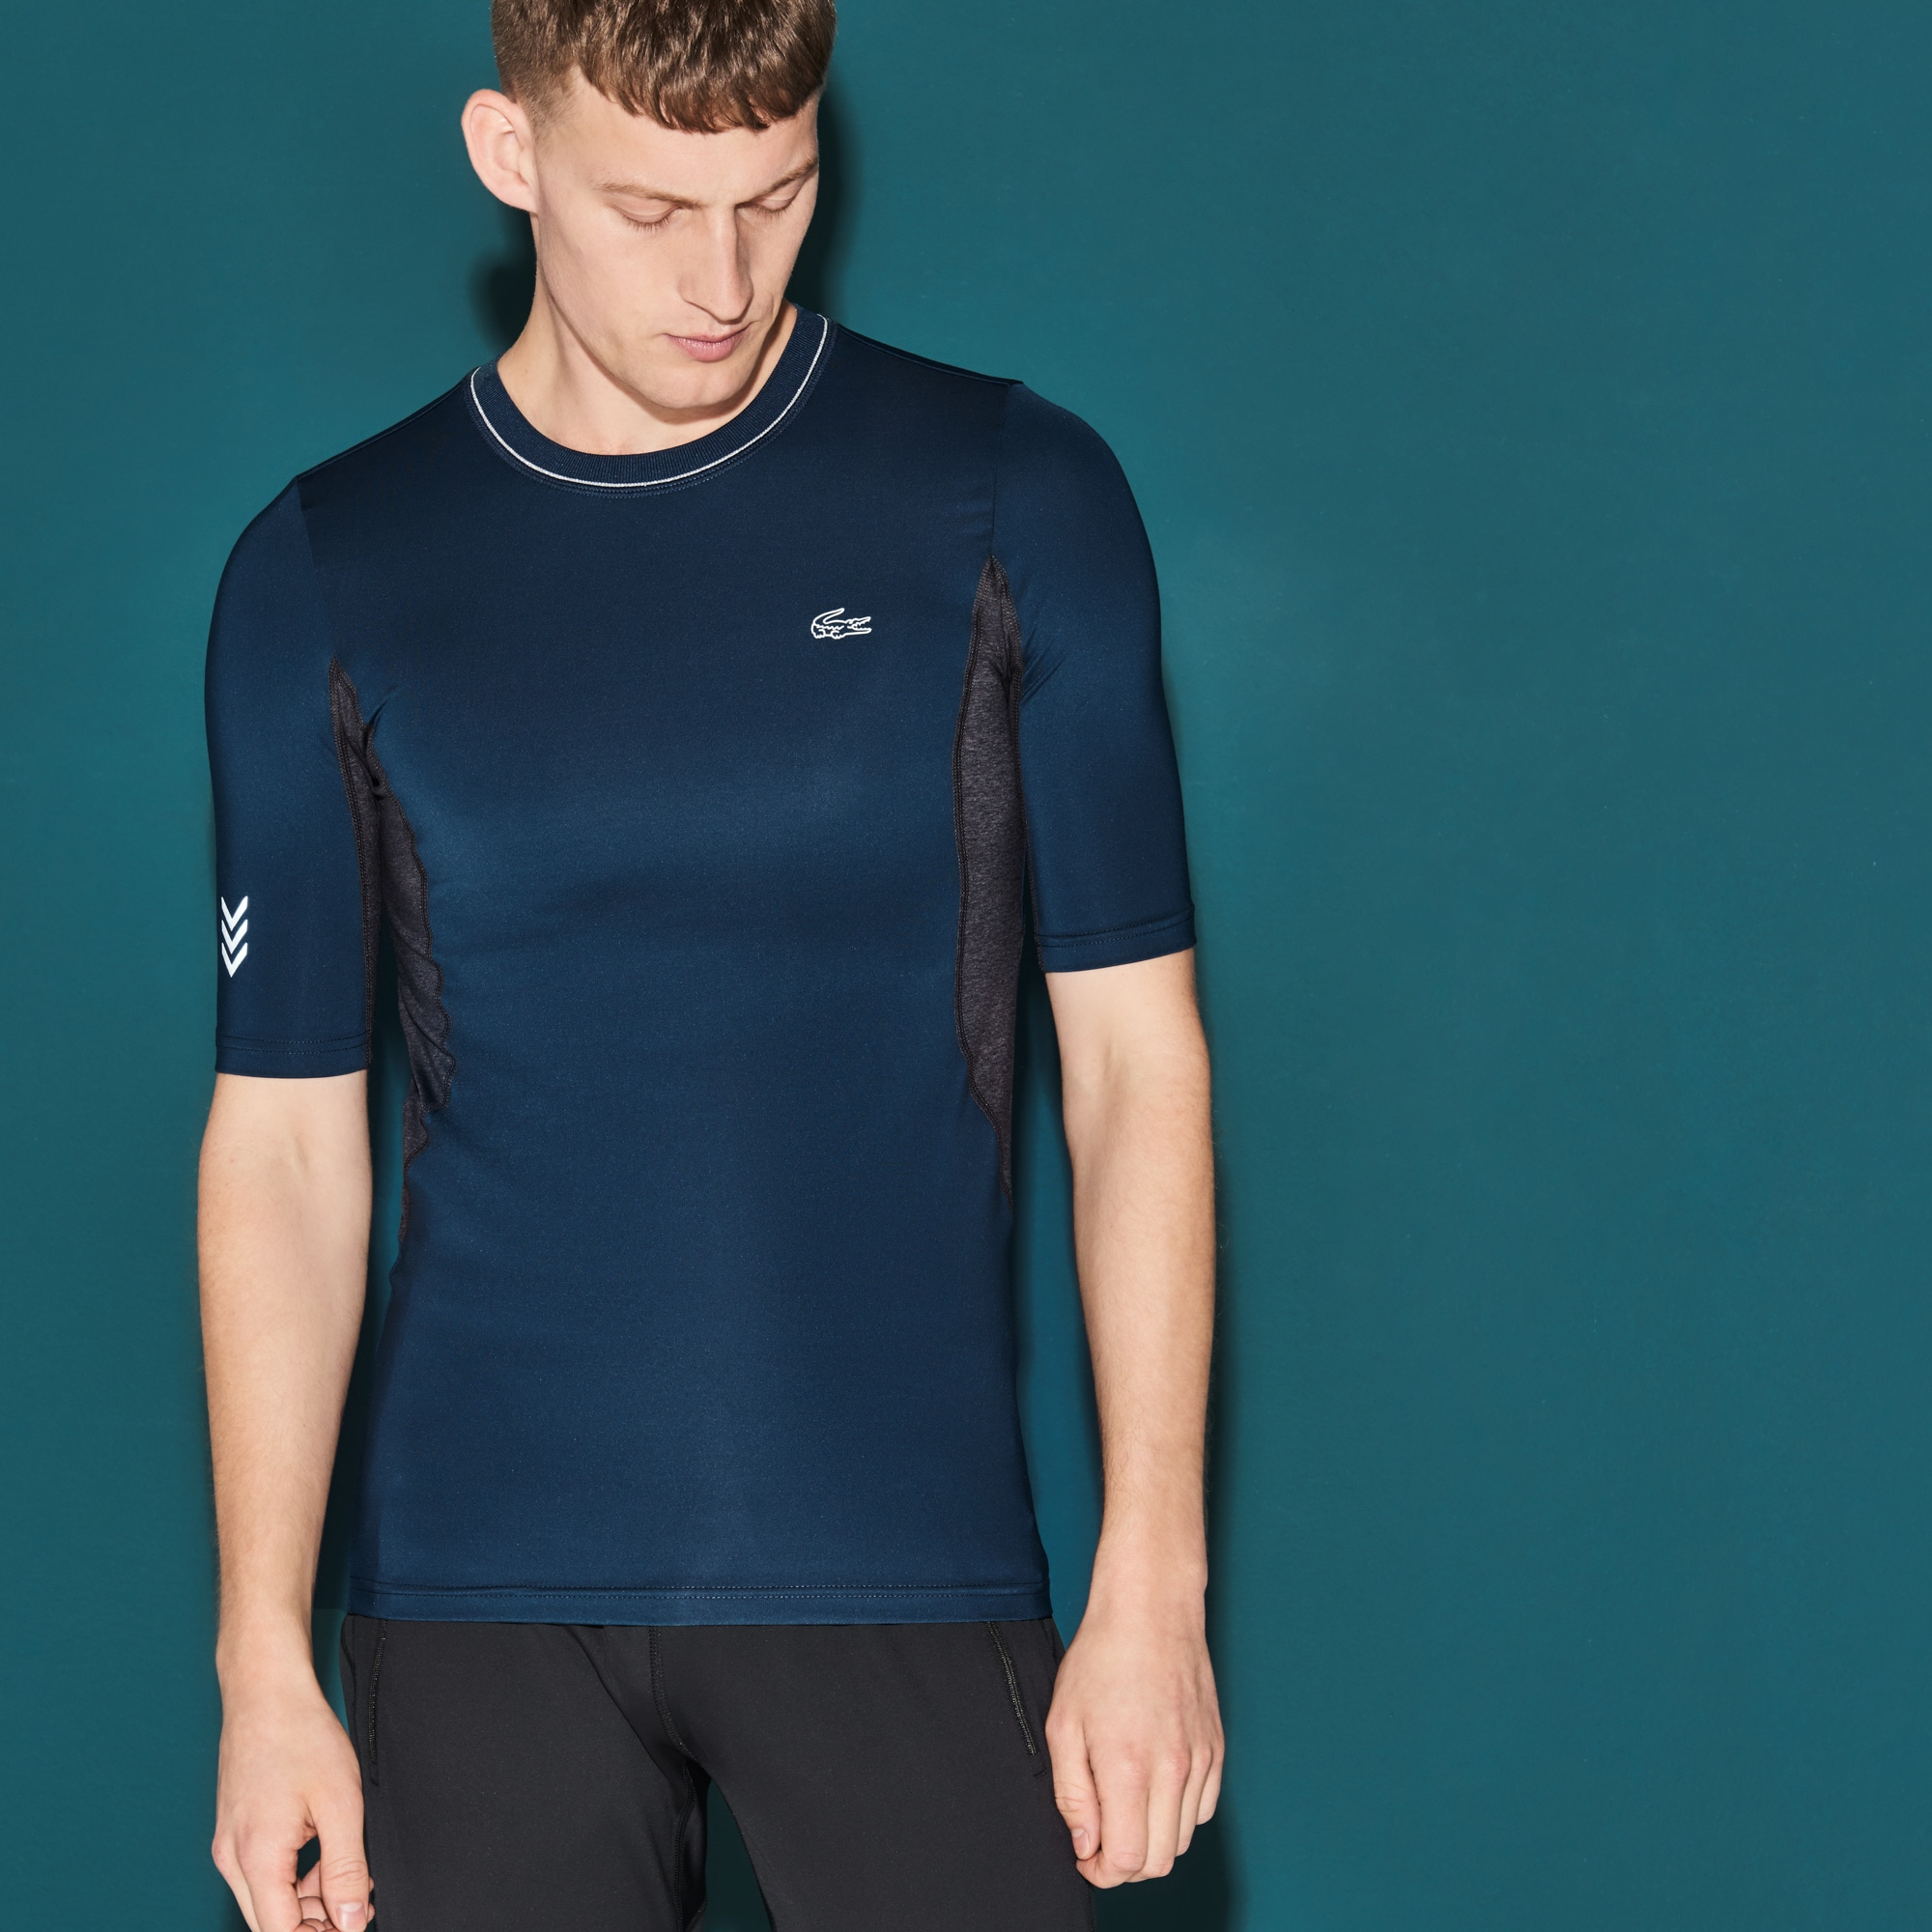 T-shirt a compressione Tennis Lacoste SPORT in jersey tecnico